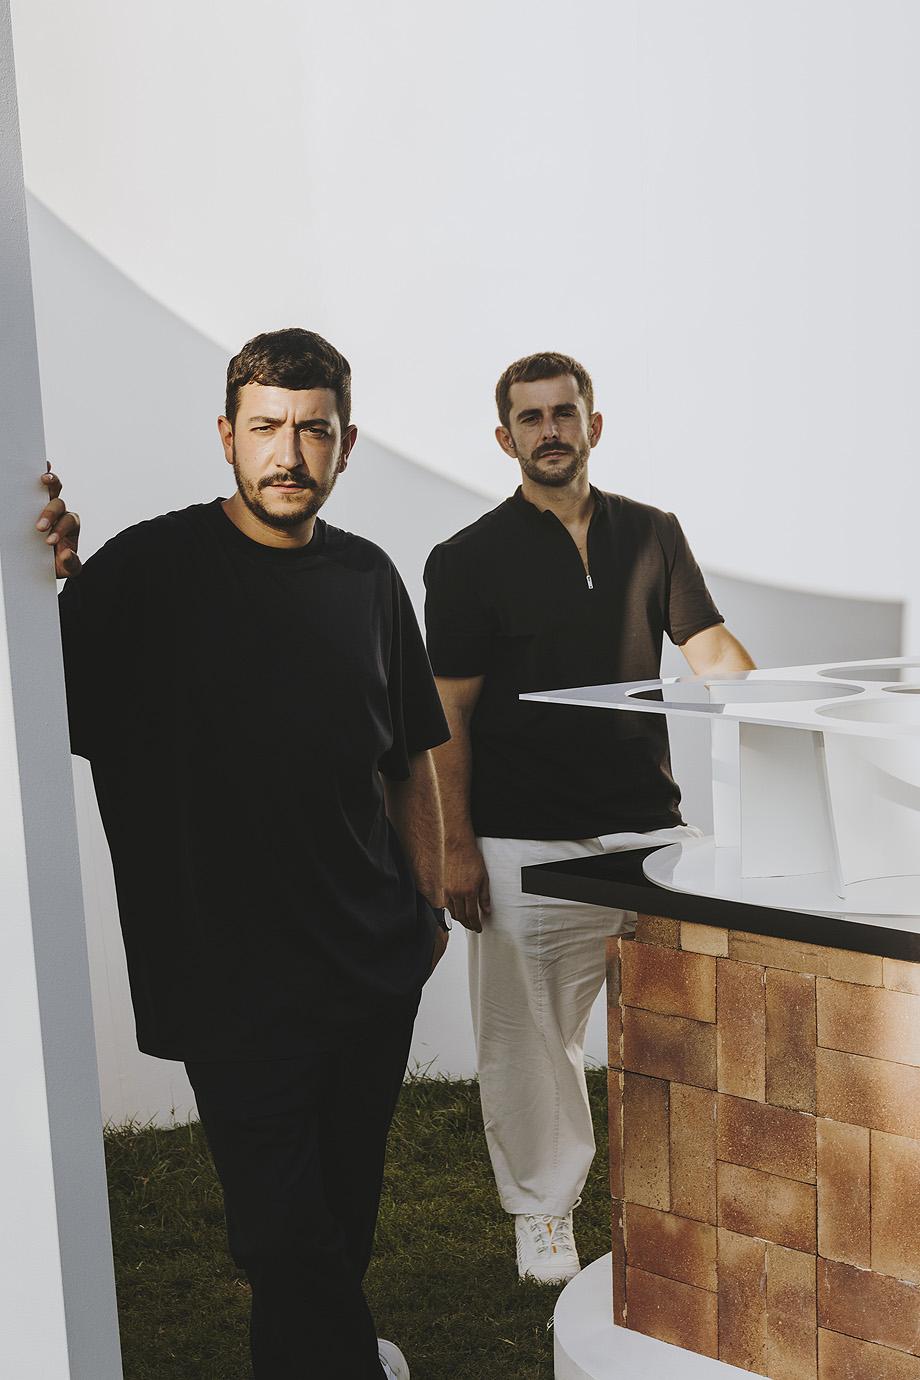 mut design invitados en das haus imm cologne 2020 (1)